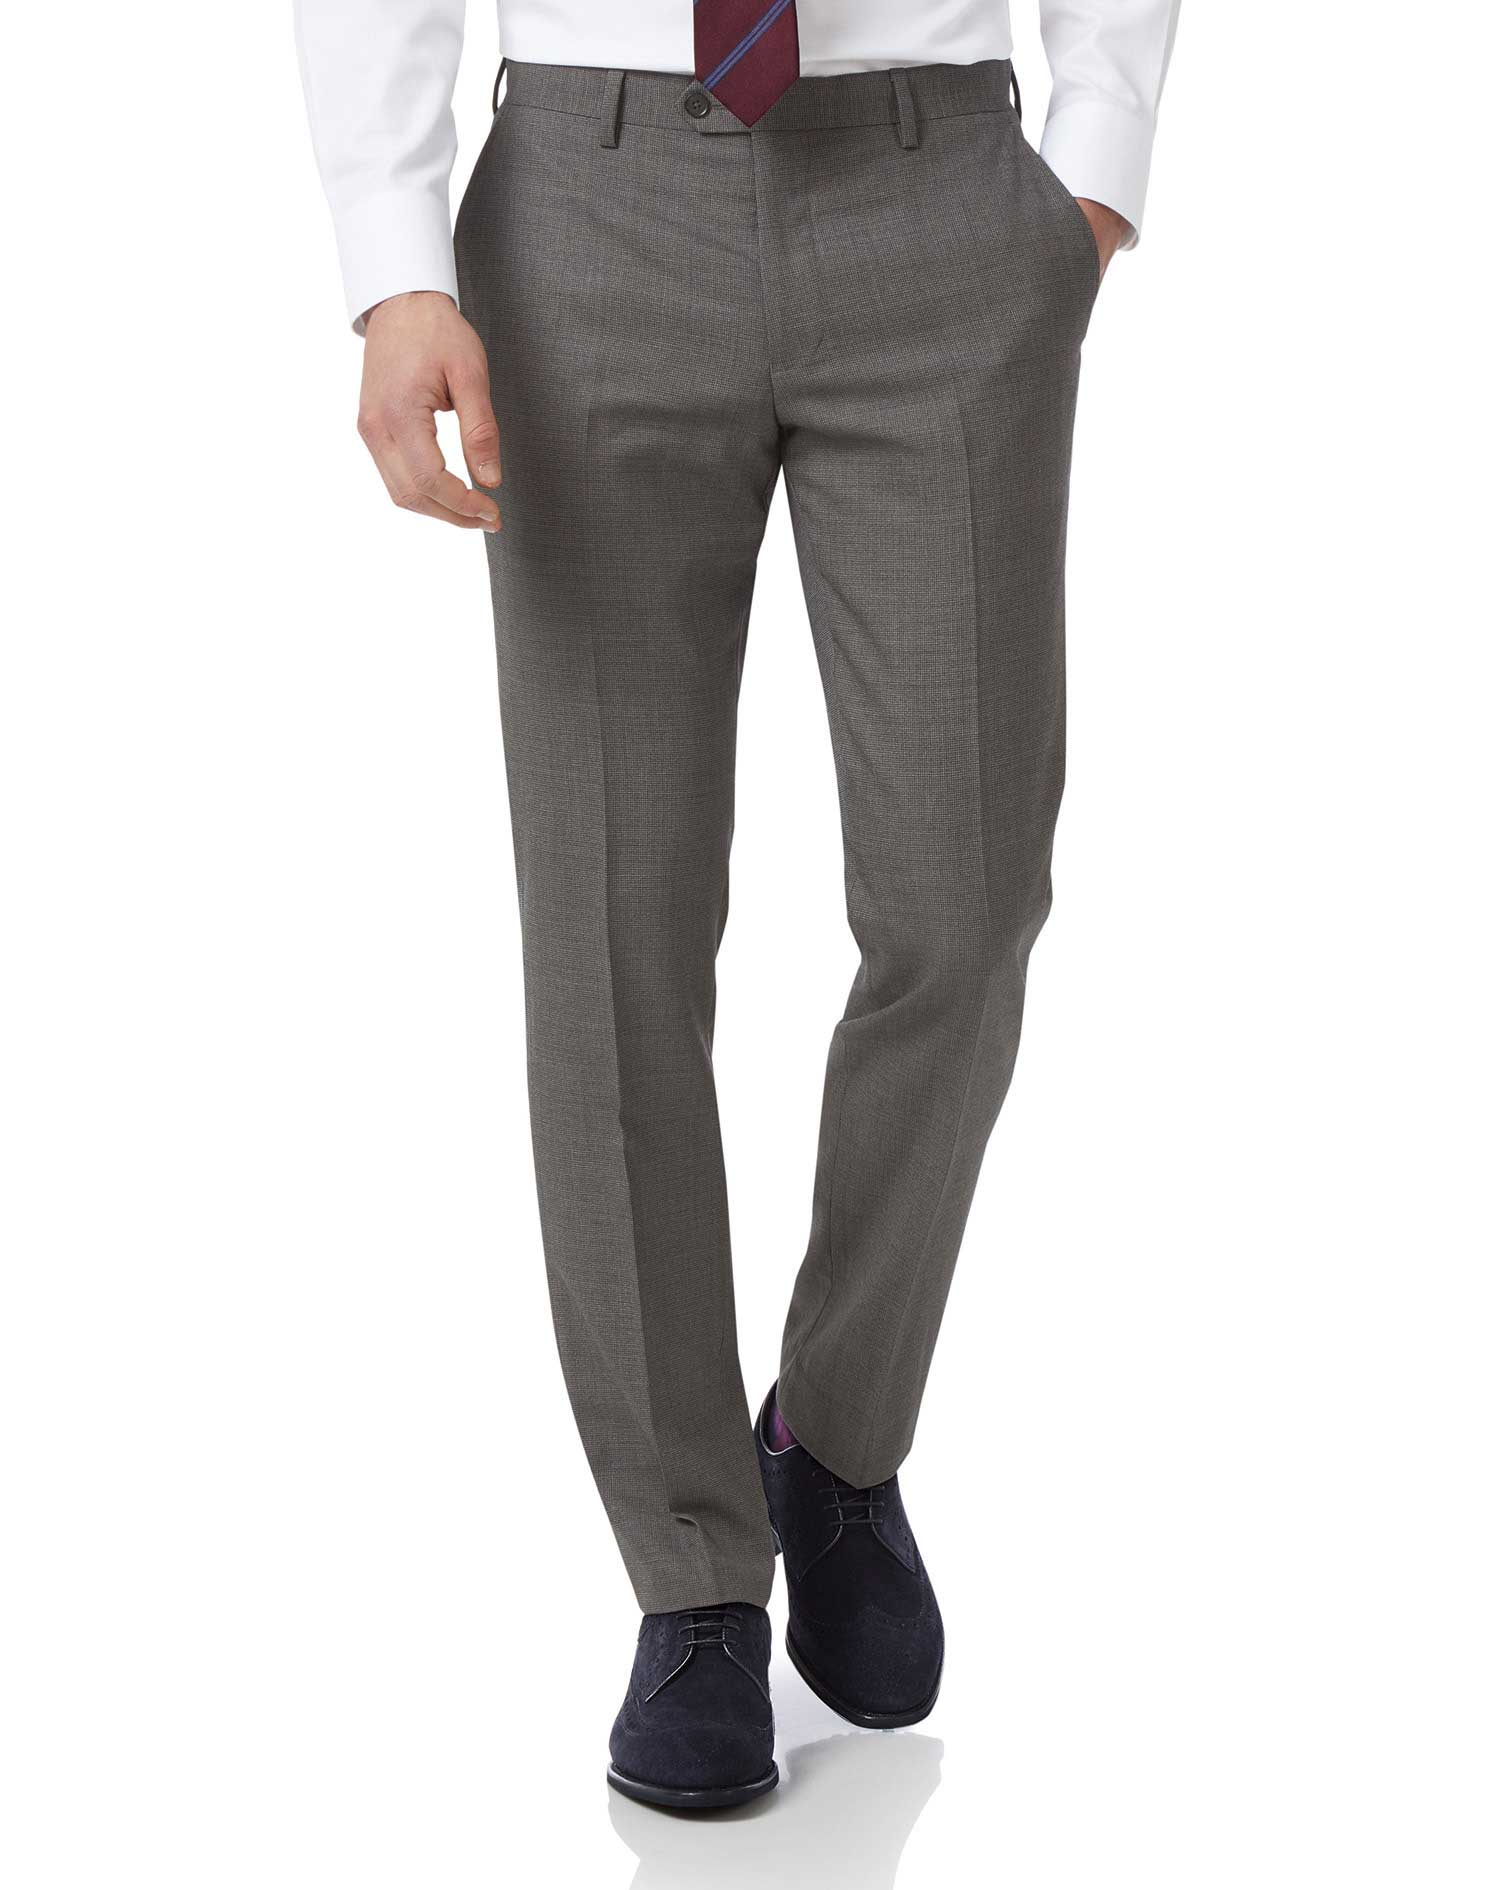 Grey Slim Jaspe Business Suit Trousers Size W34 L38 by Charles Tyrwhitt